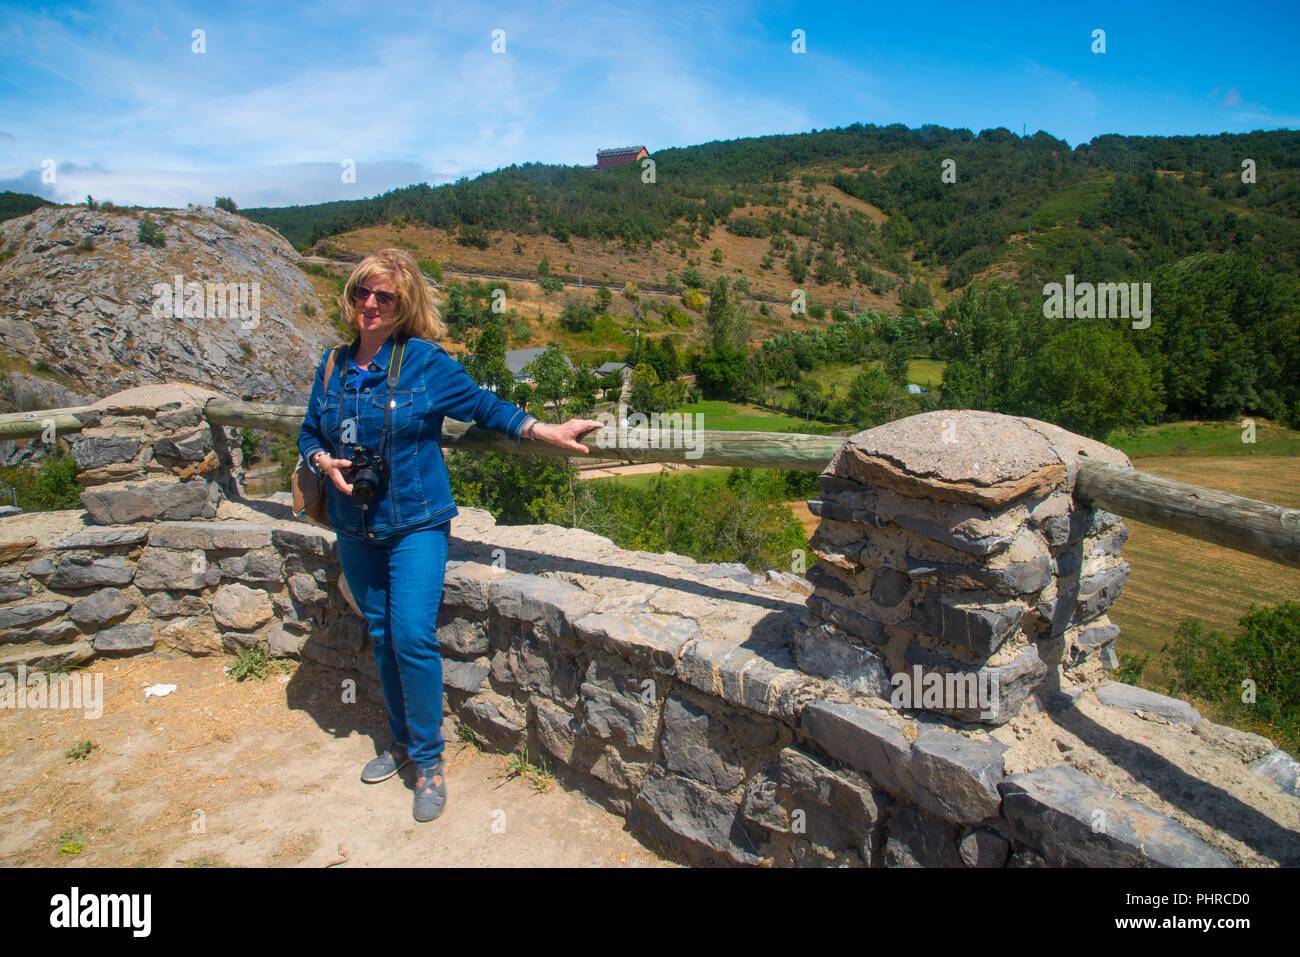 Woman at the viewpoint. Ruesga, Palencia province, Castilla Leon, Spain. - Stock Image